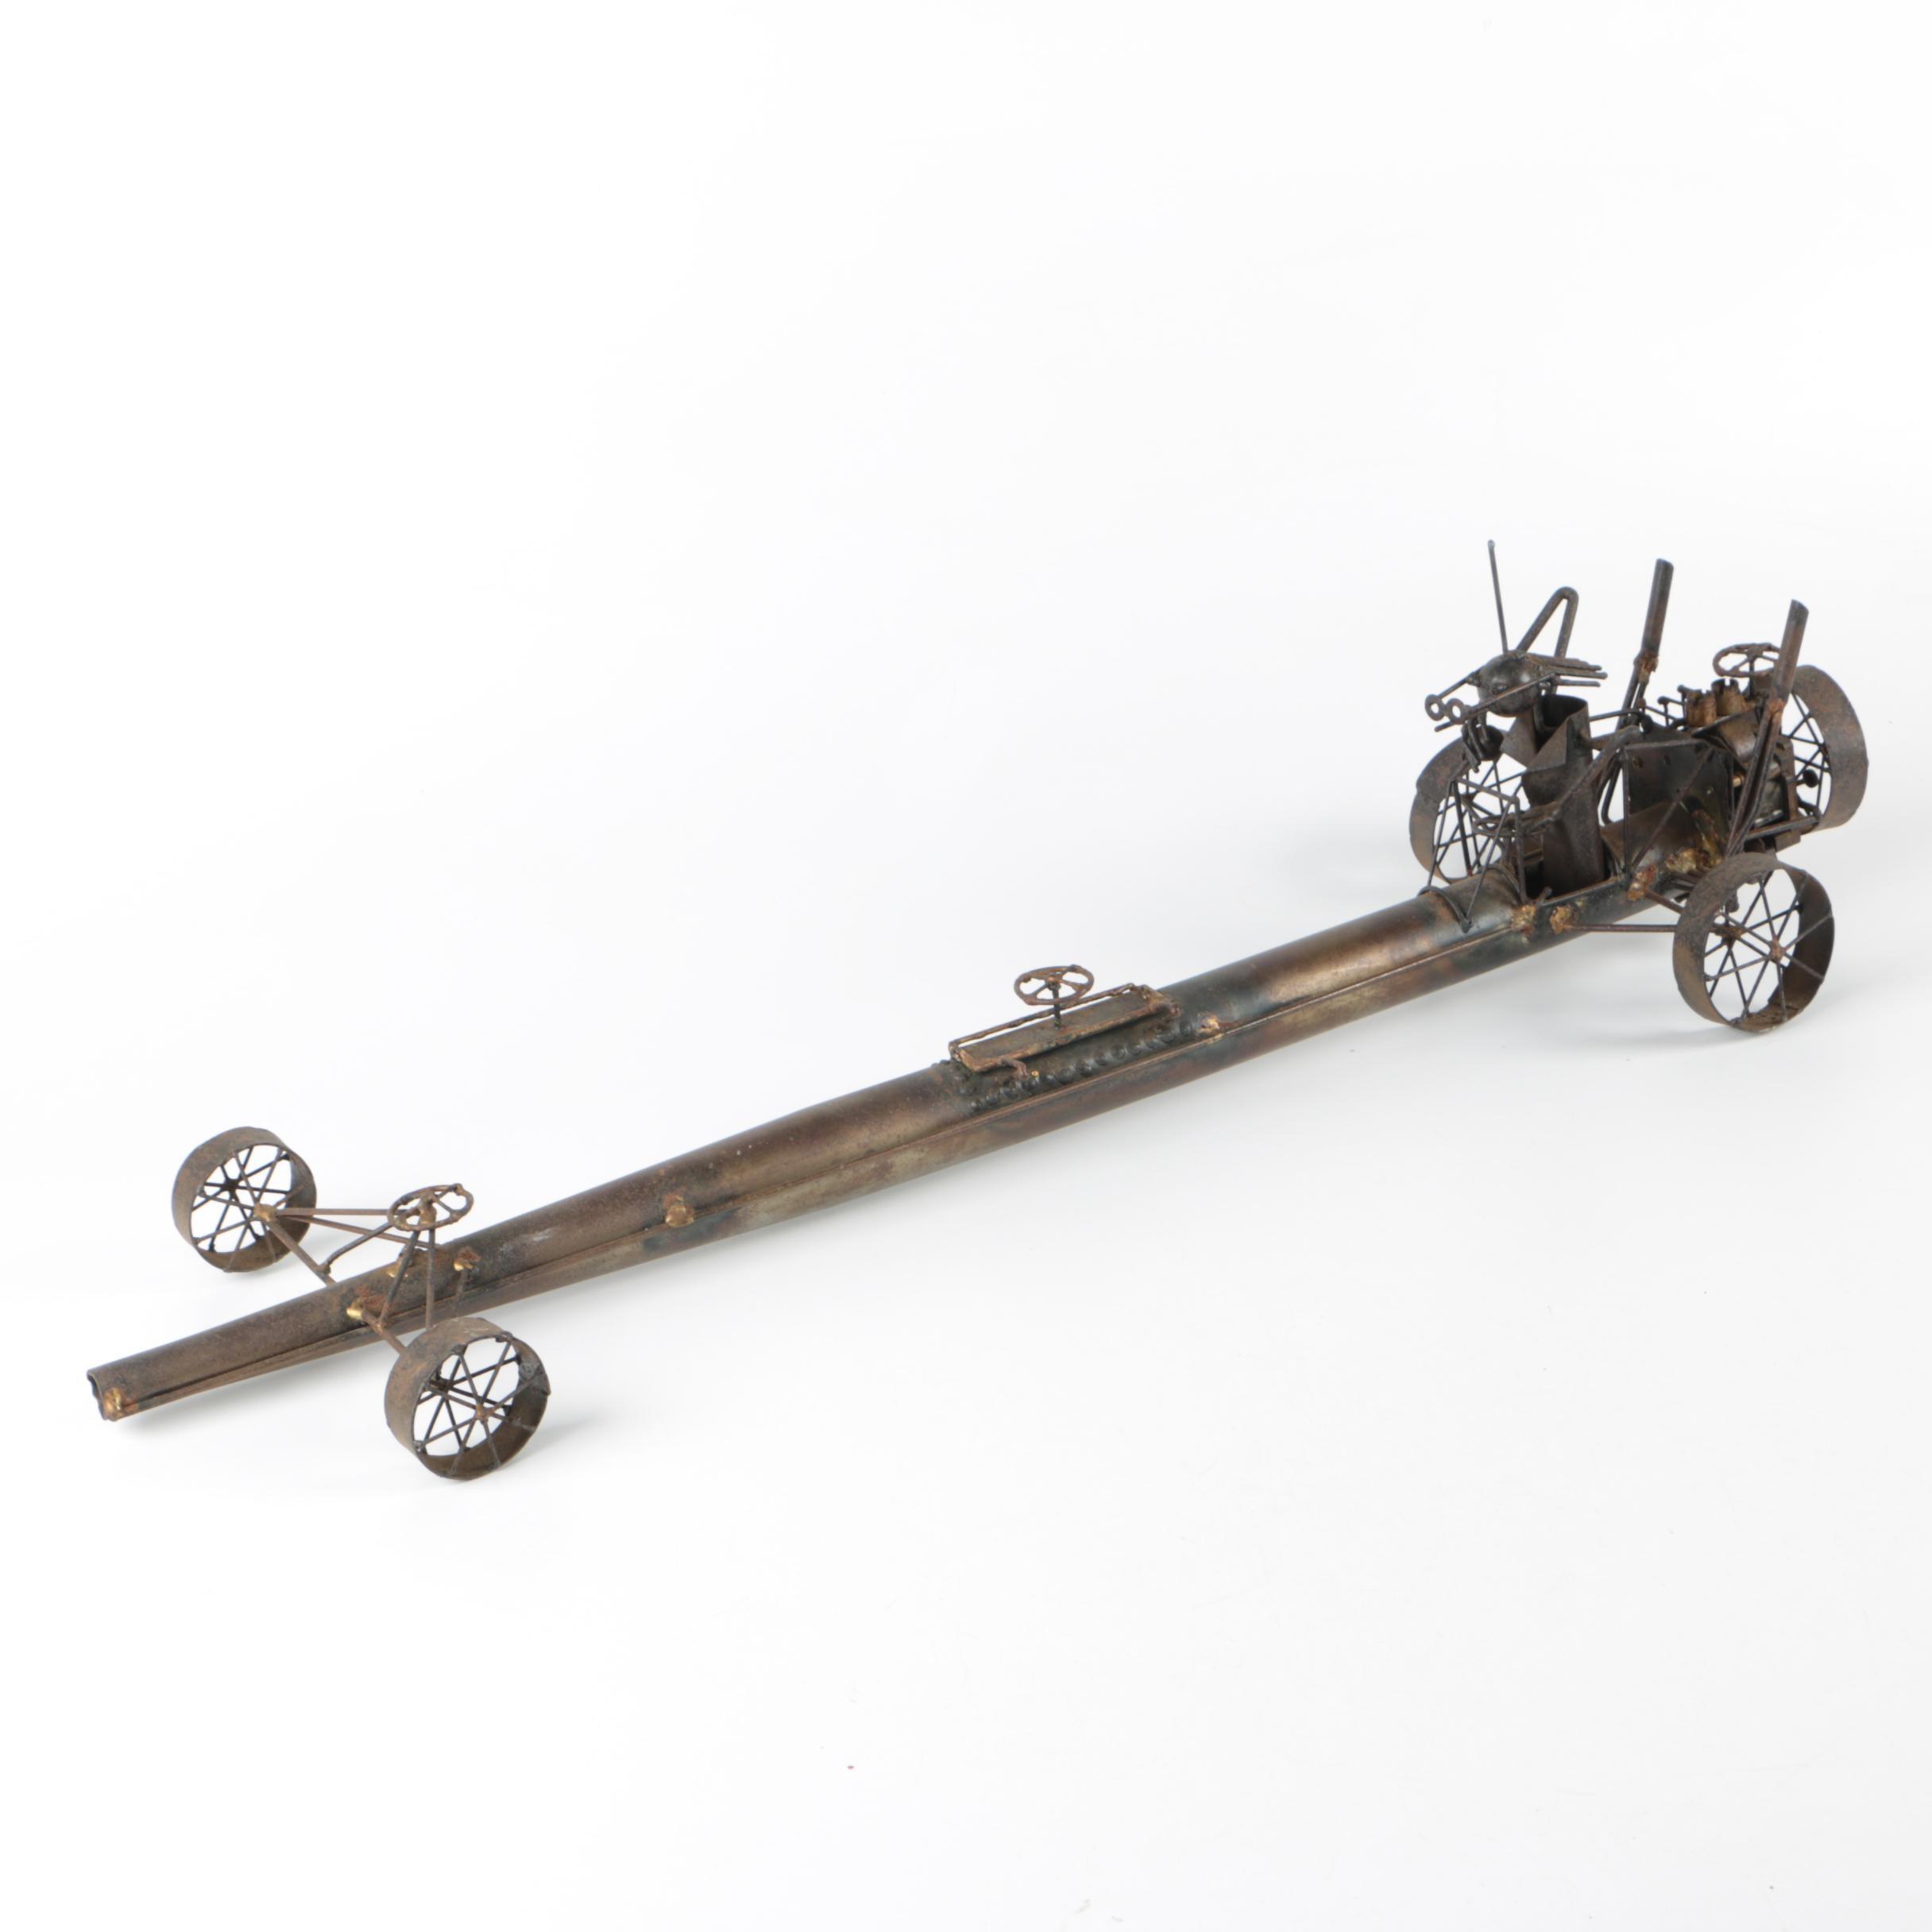 Brass Tone Race Car Sculpture